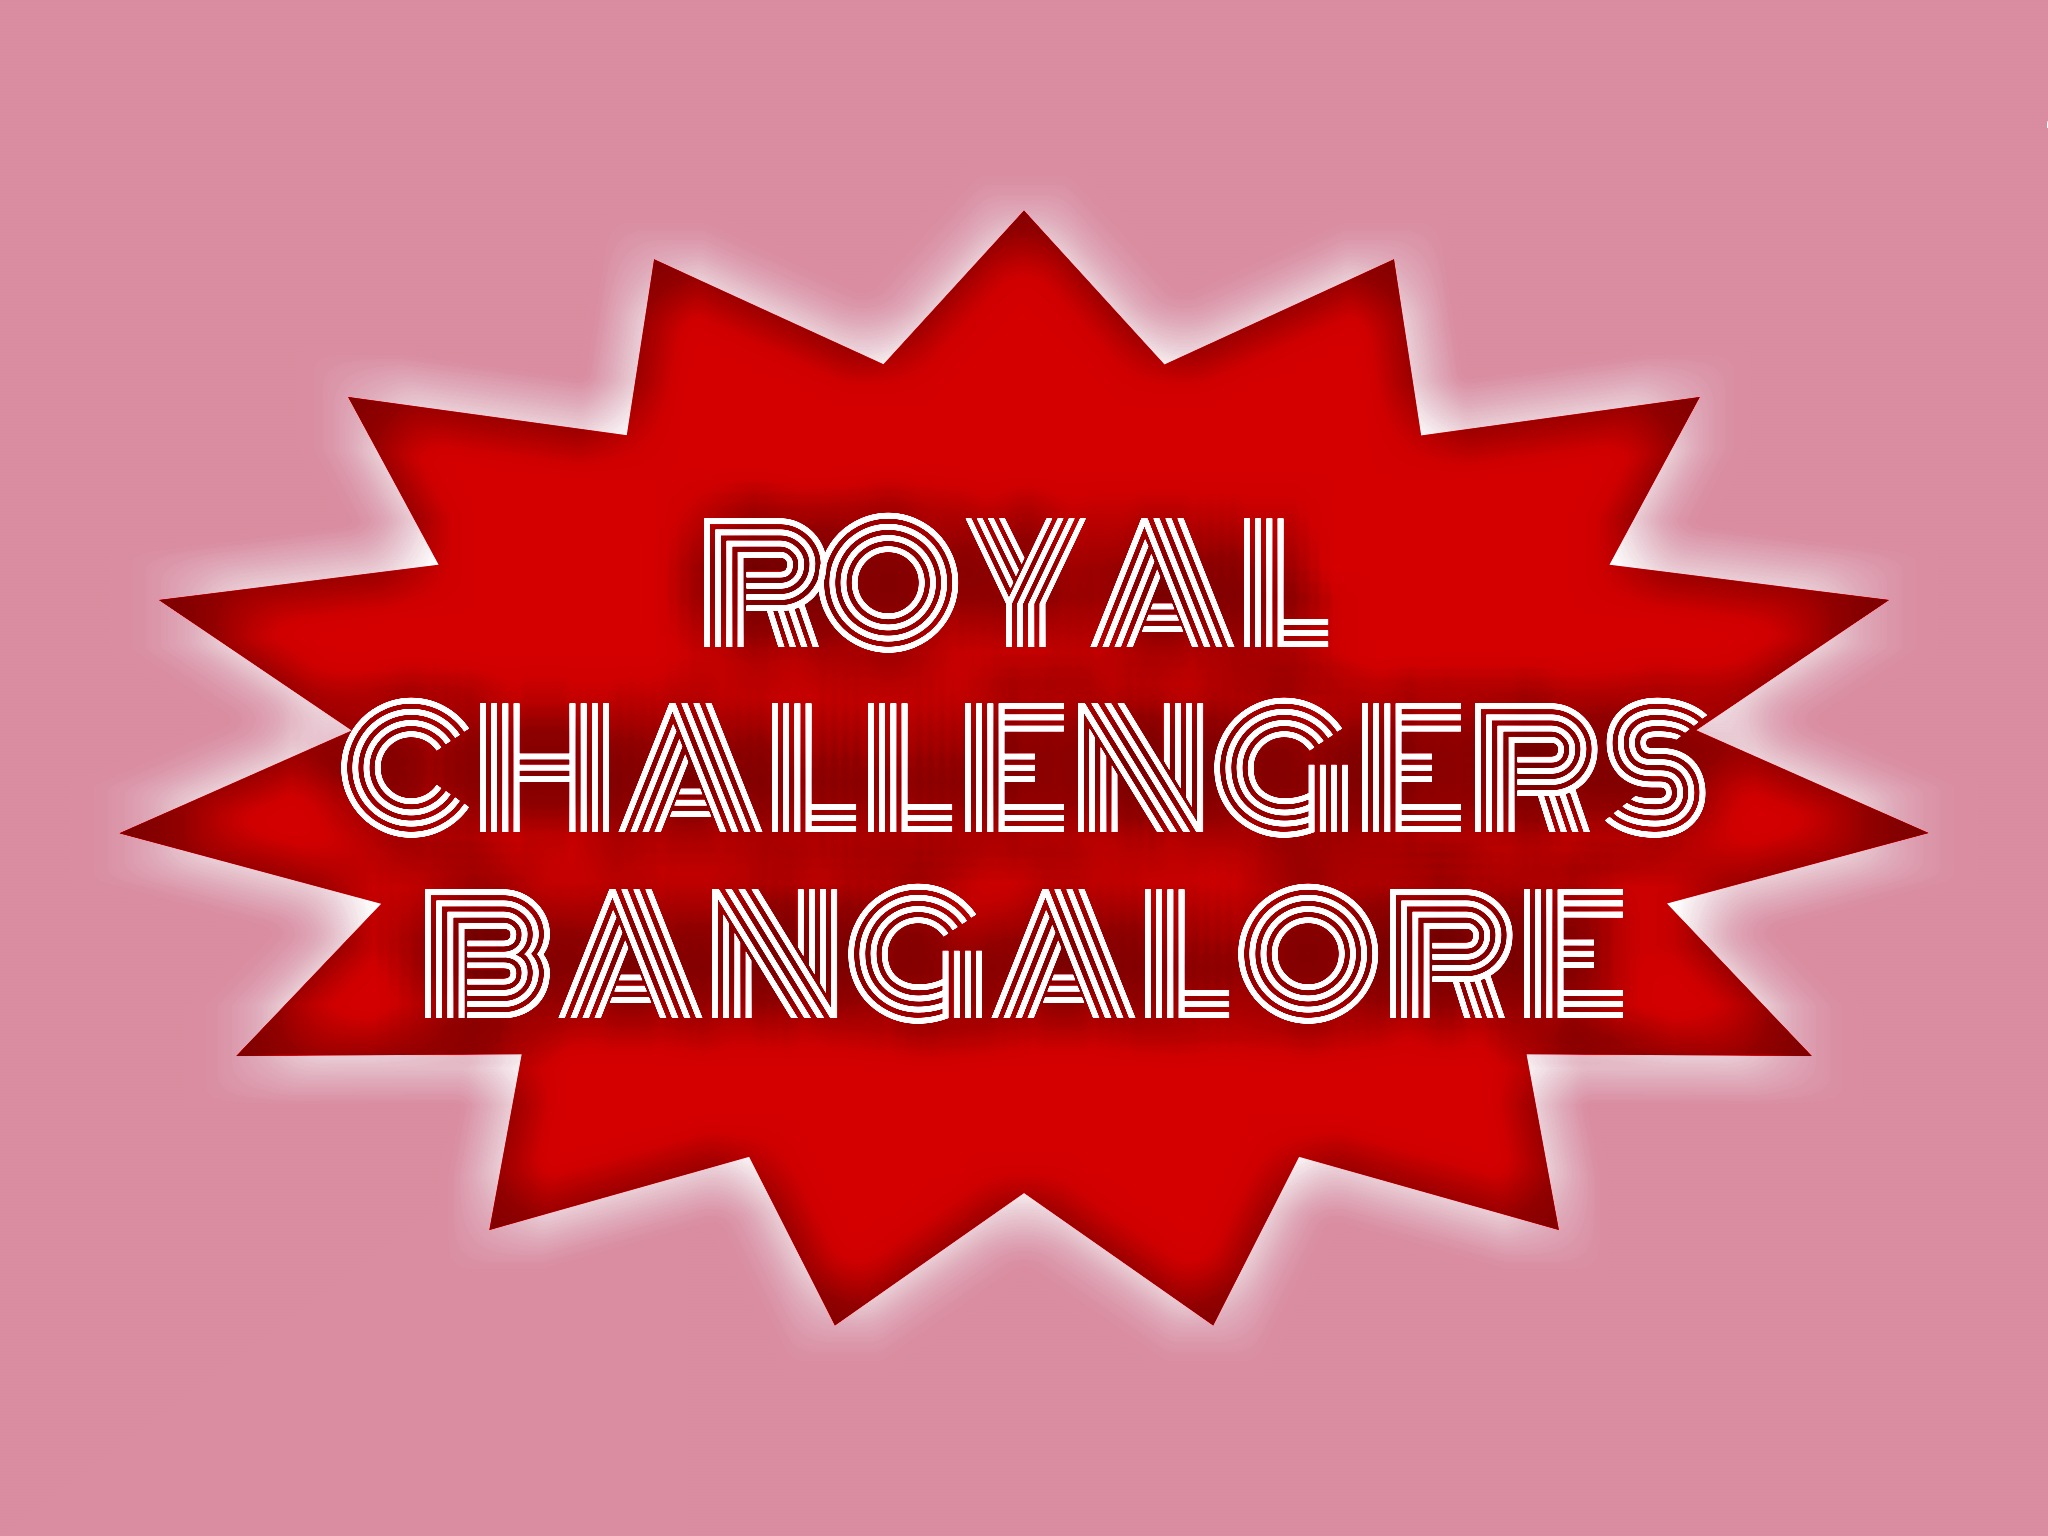 Royal challengers Bangalore illustration